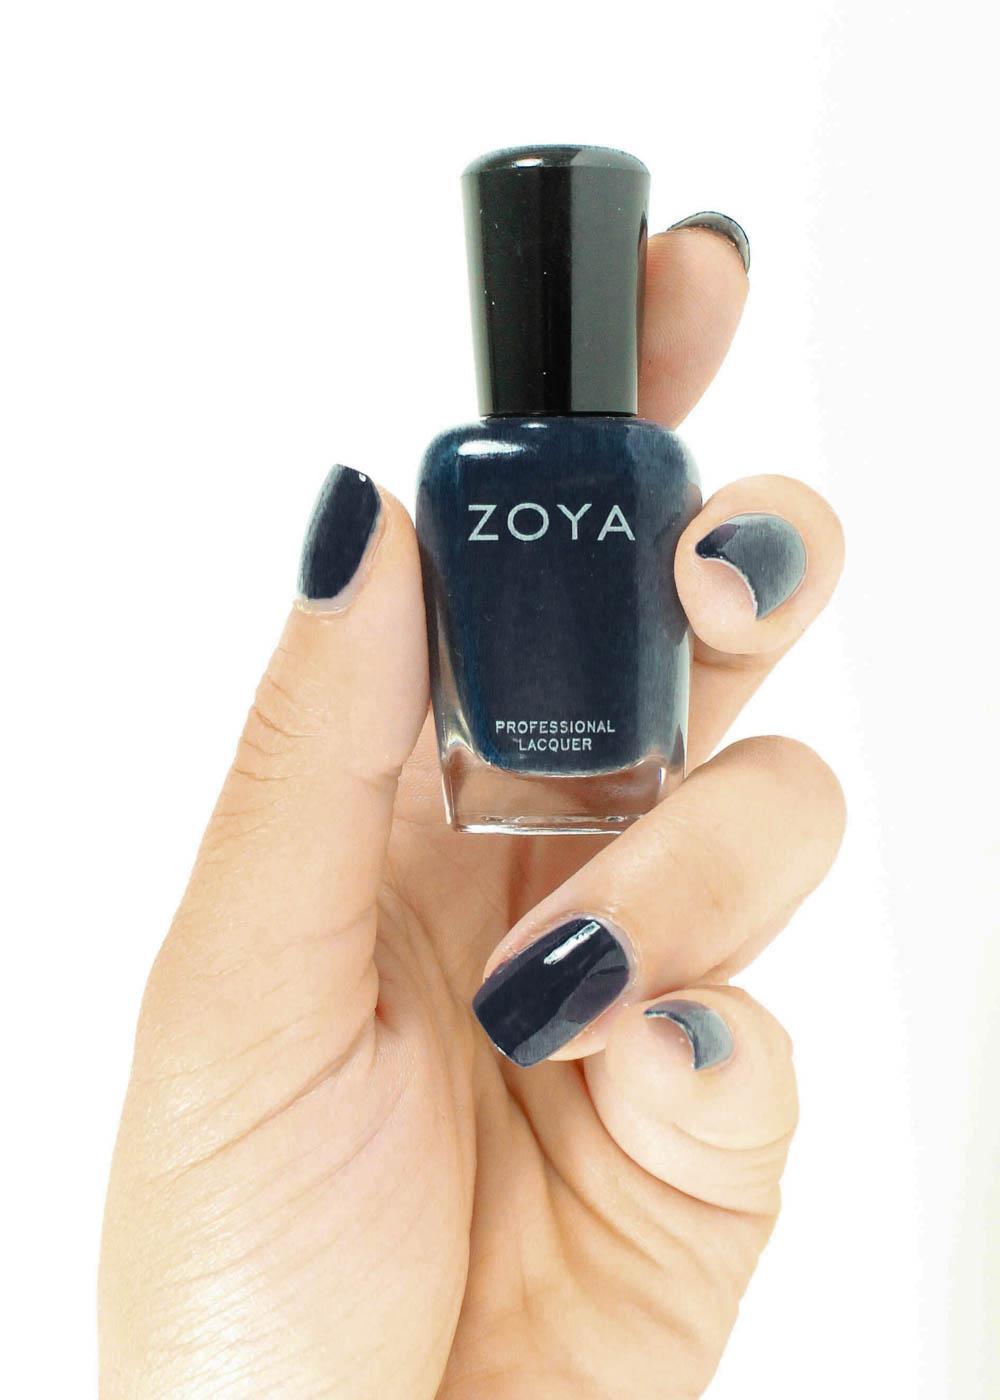 Top 5 Fall 2017 Nail Polishes To Wear | Zoya Natty Review | The Beauty Vanity